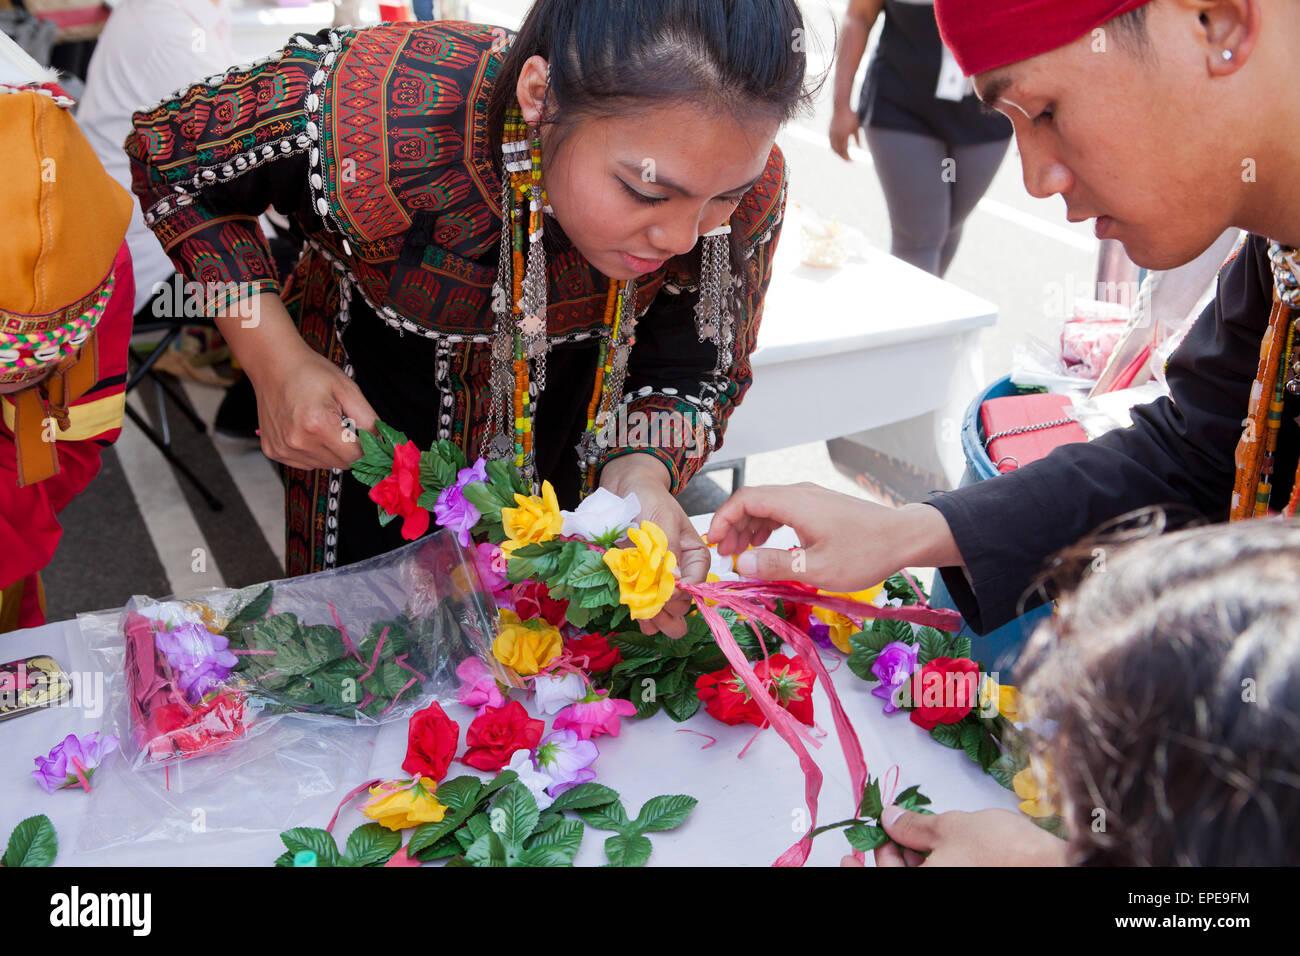 Taiwanese indigenous youth crafting decorations at National Asian Heritage Festival - Washington, DC USA - Stock Image